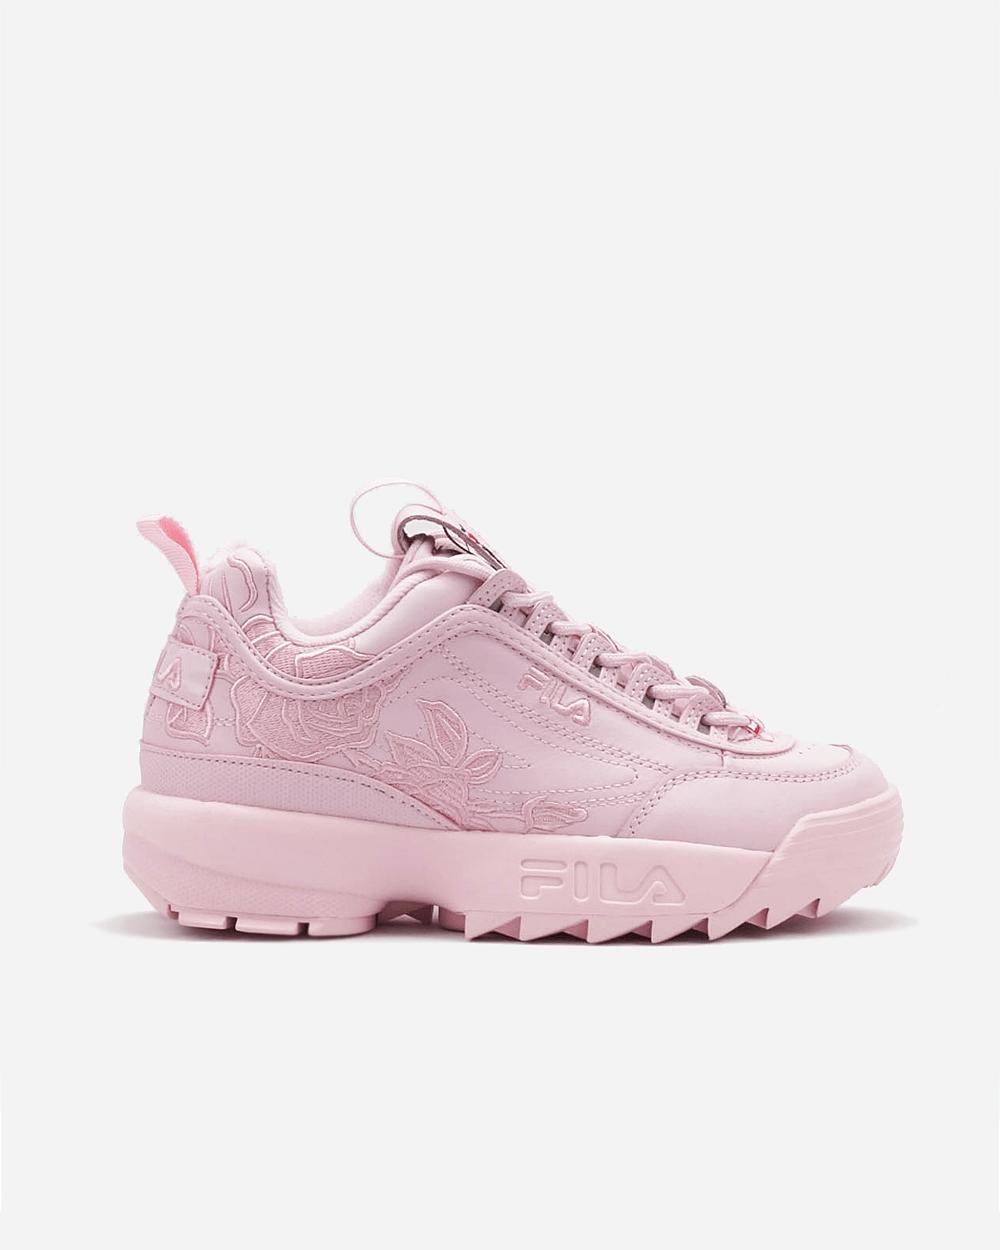 fila-disruptor-ii-embroidery-chalk-pink-womens-sneaker-01